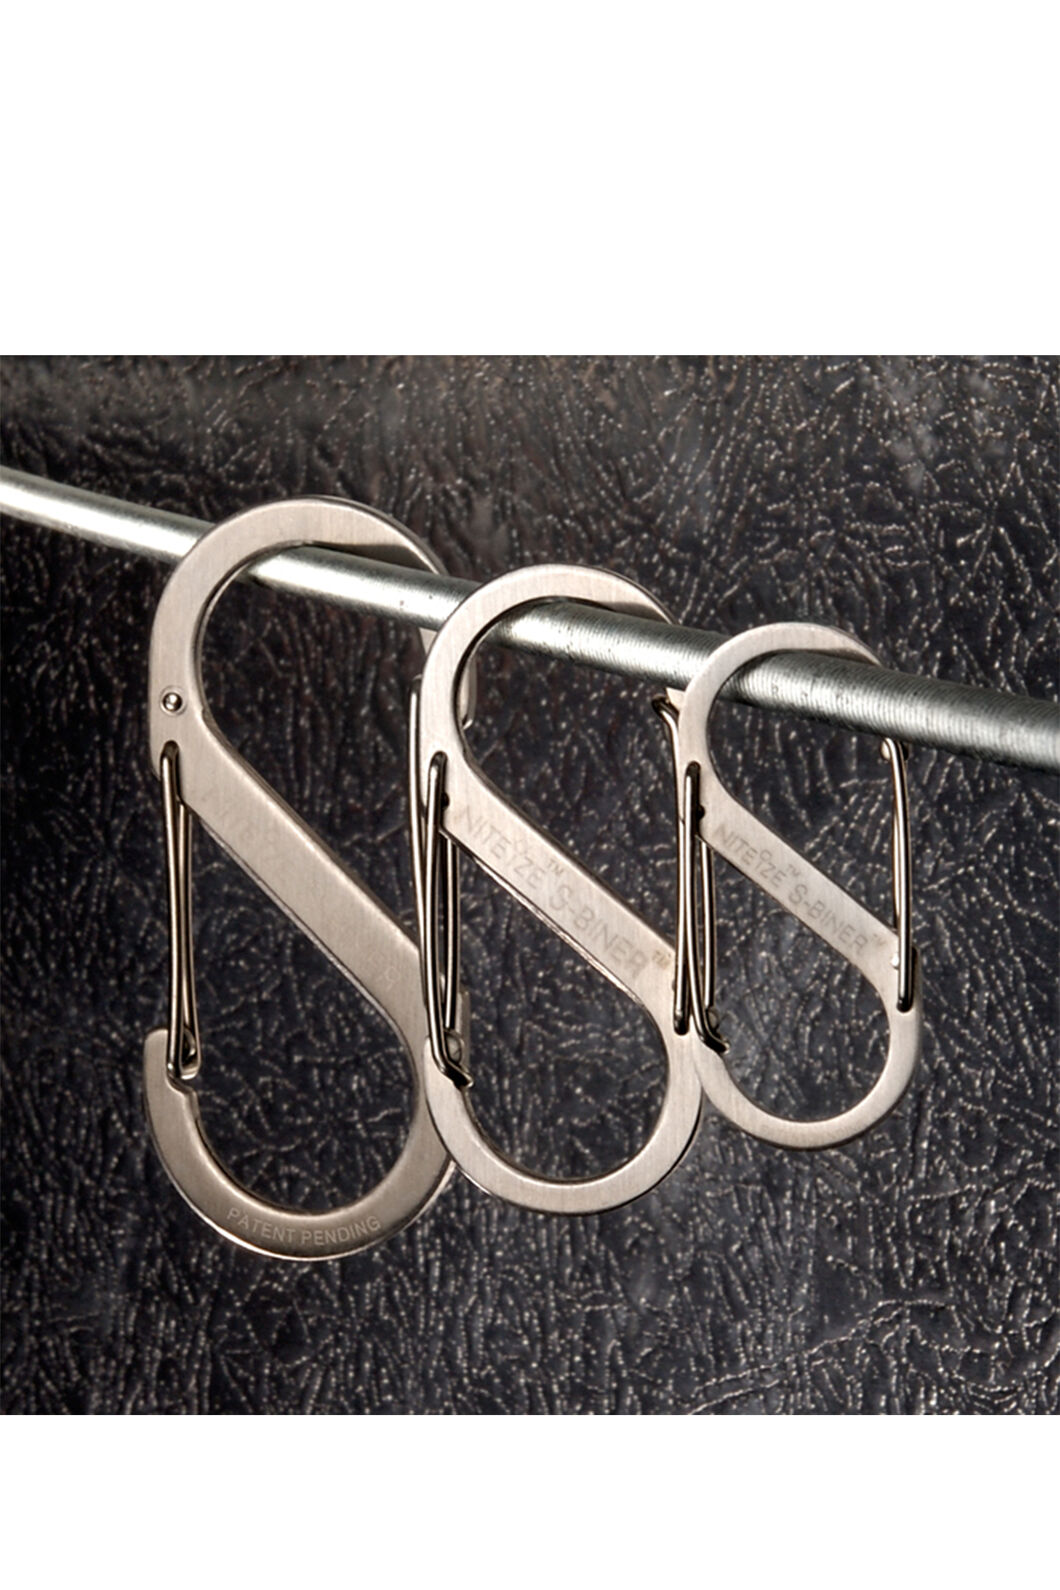 Nite Ize Stainless Steel S-Biner Carabiner 3 Pack, None, hi-res